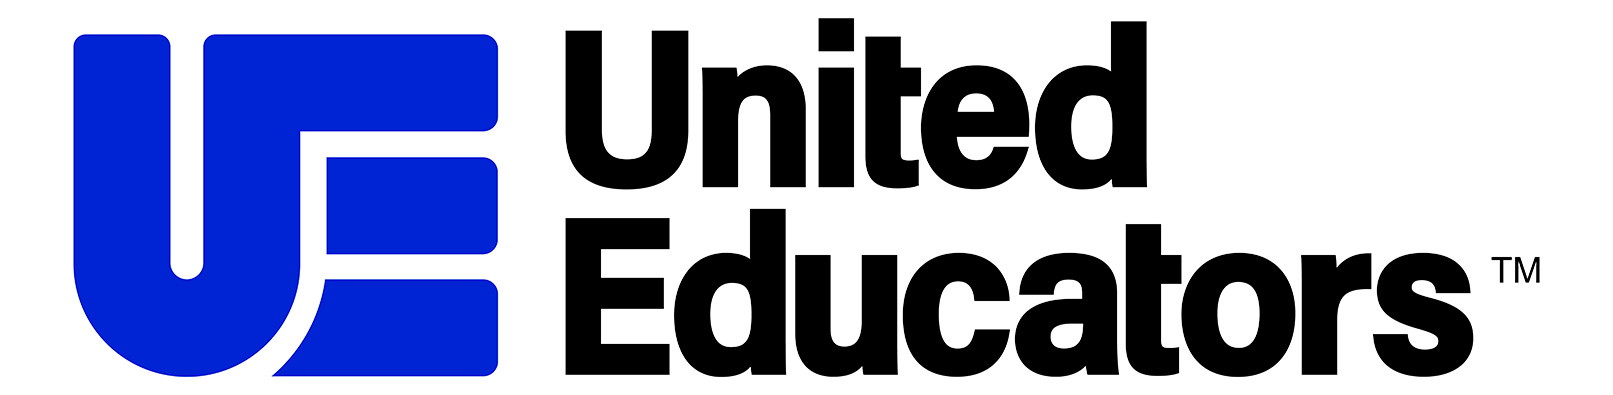 United Educators Insurance